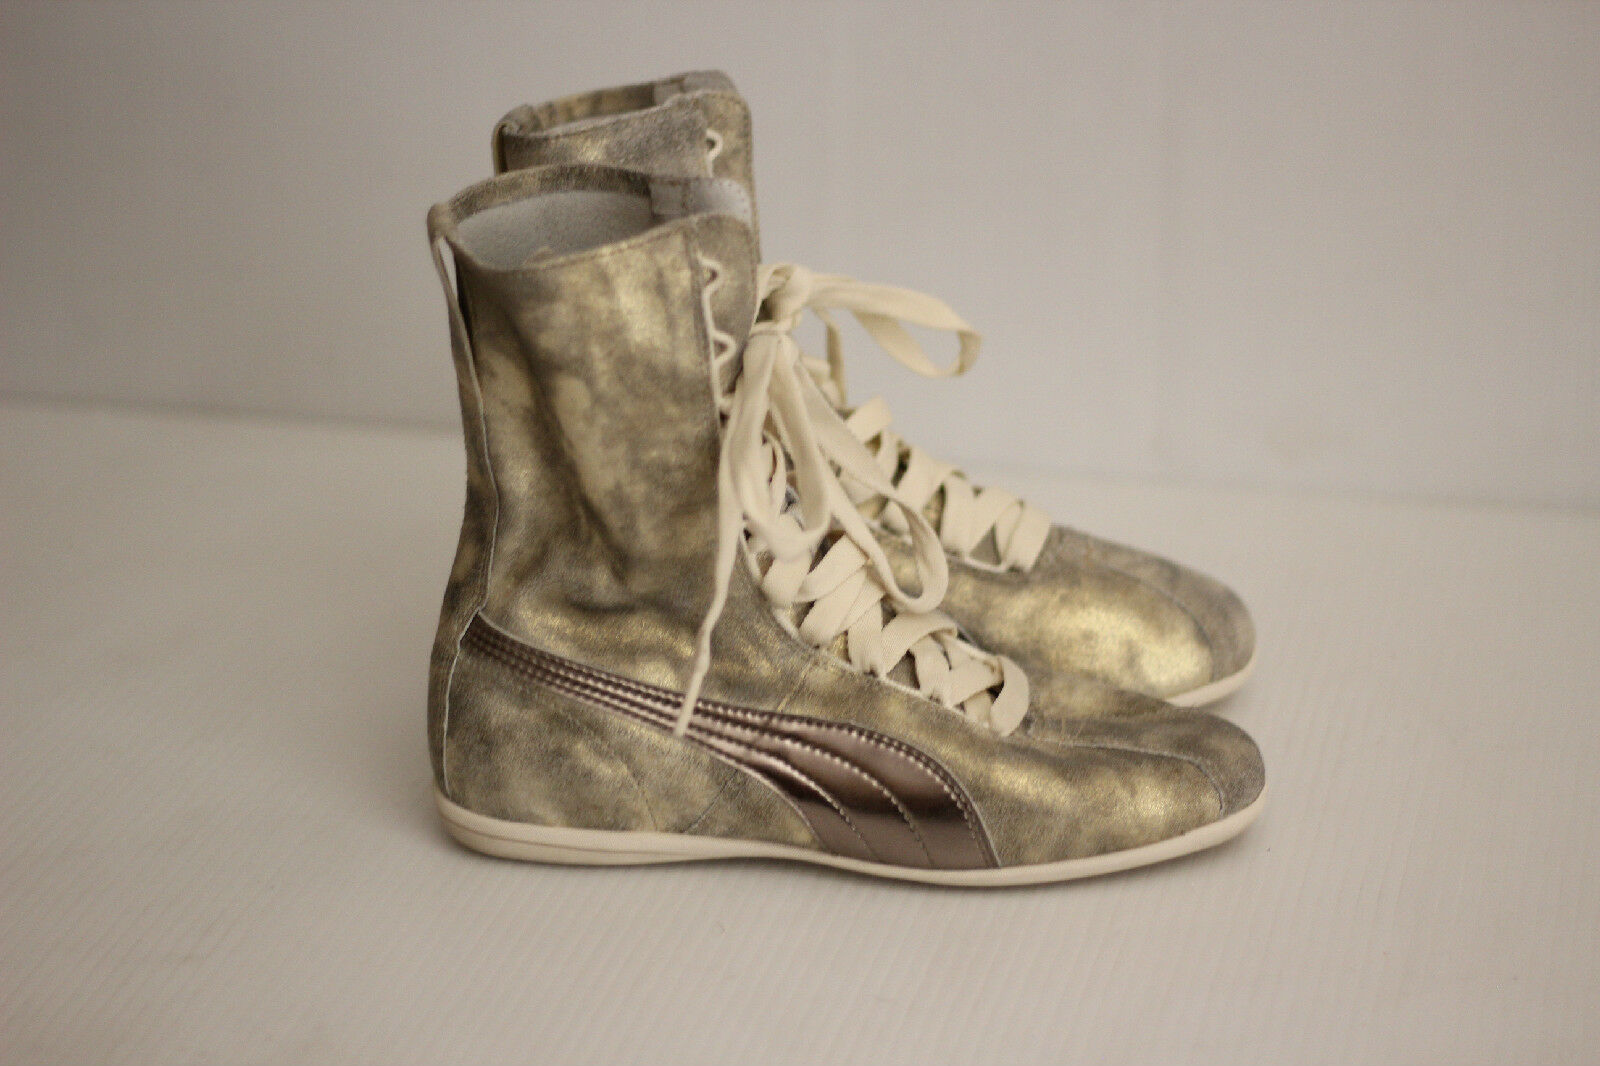 PUMA Eskiva Hi Gold Metallic Lace Up Leather Sneaker Boot Bootie - 6.5US  (B72)